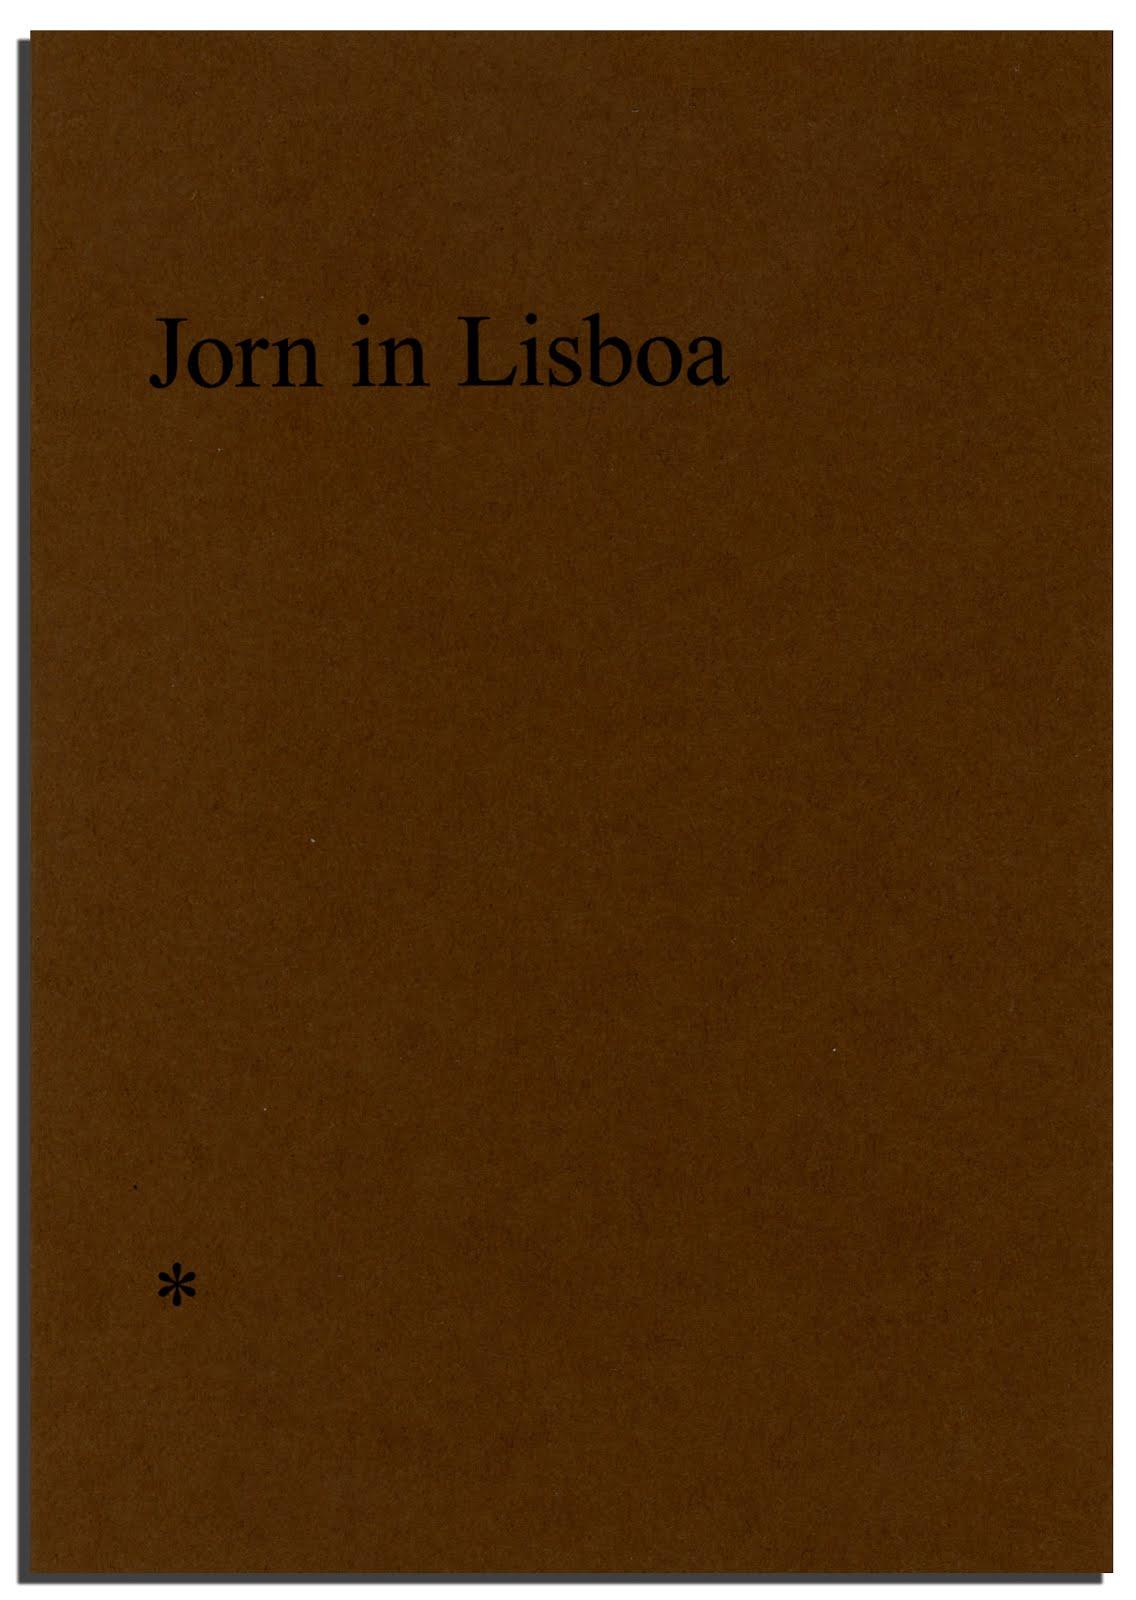 Jorn in Lisboa